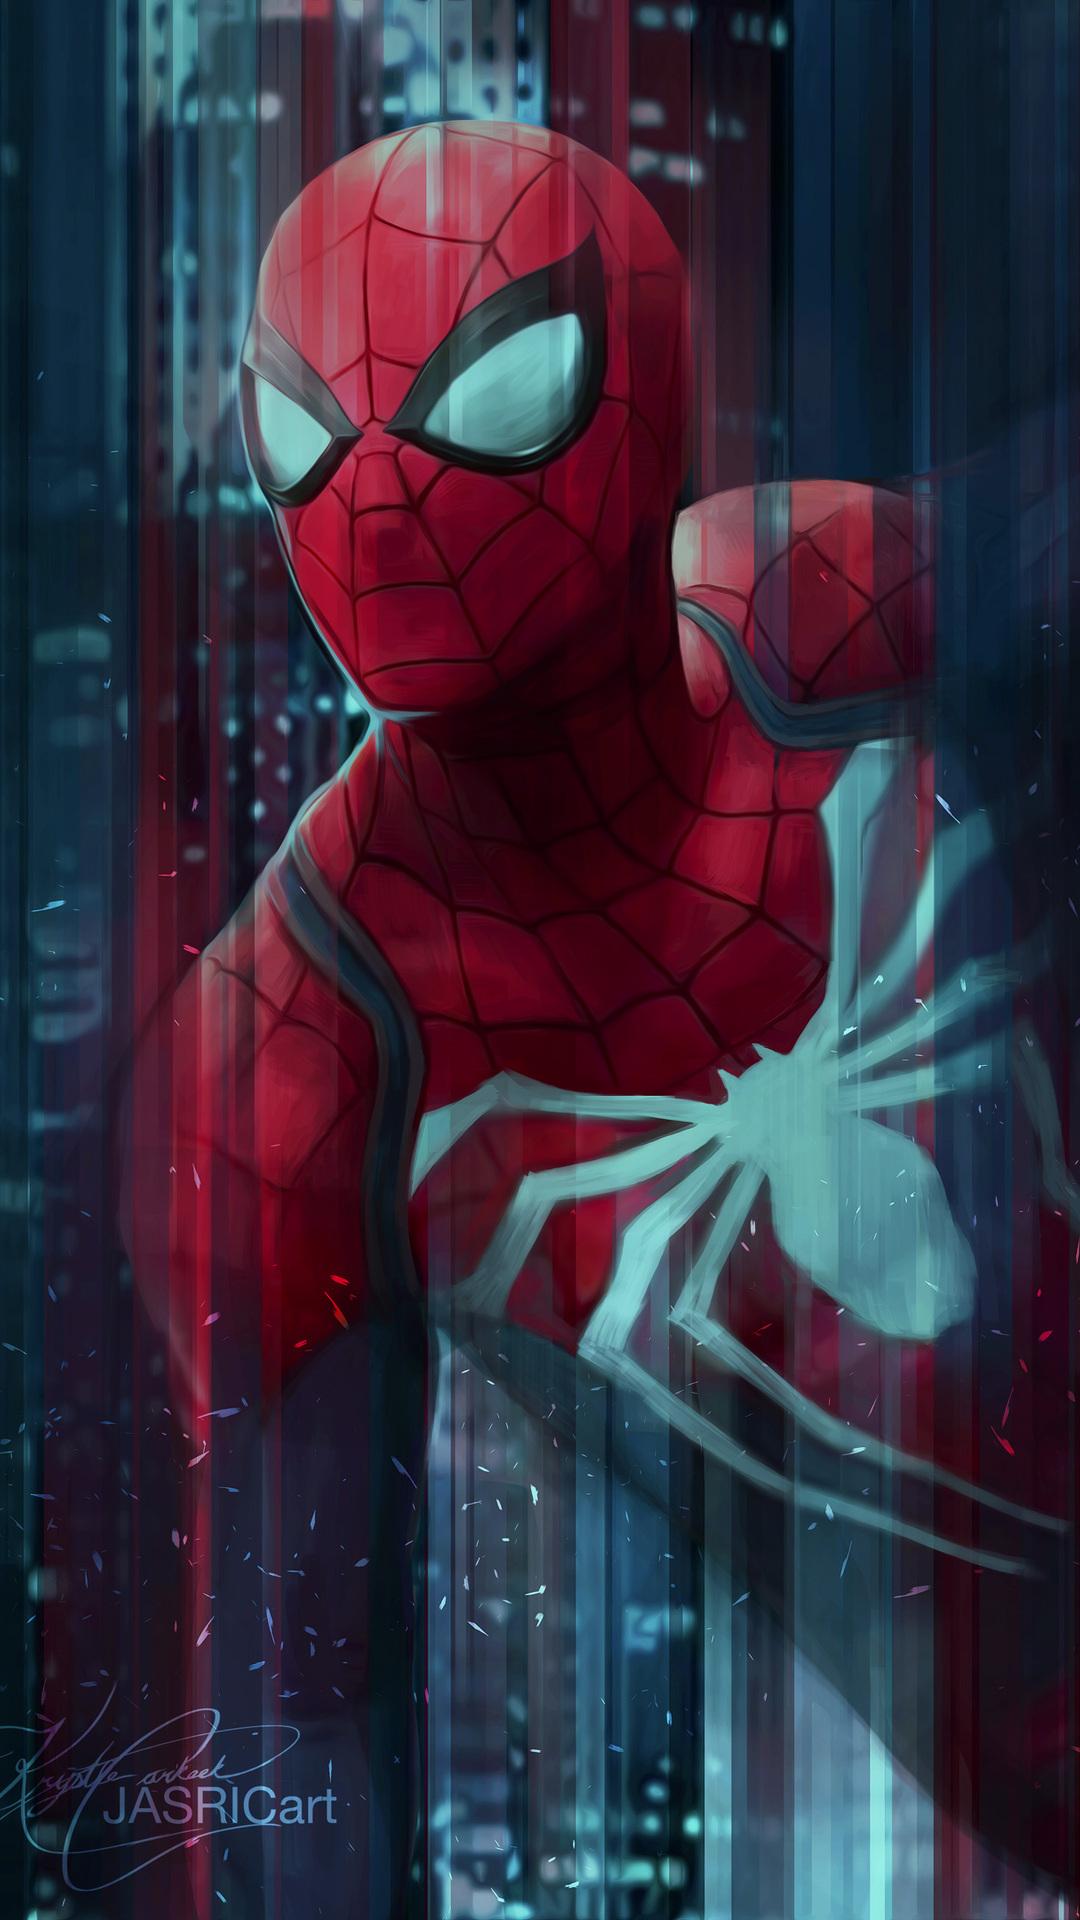 1080x1920 spiderman digital art 4k iphone 7 6s 6 plus - Marvel android wallpaper hd ...